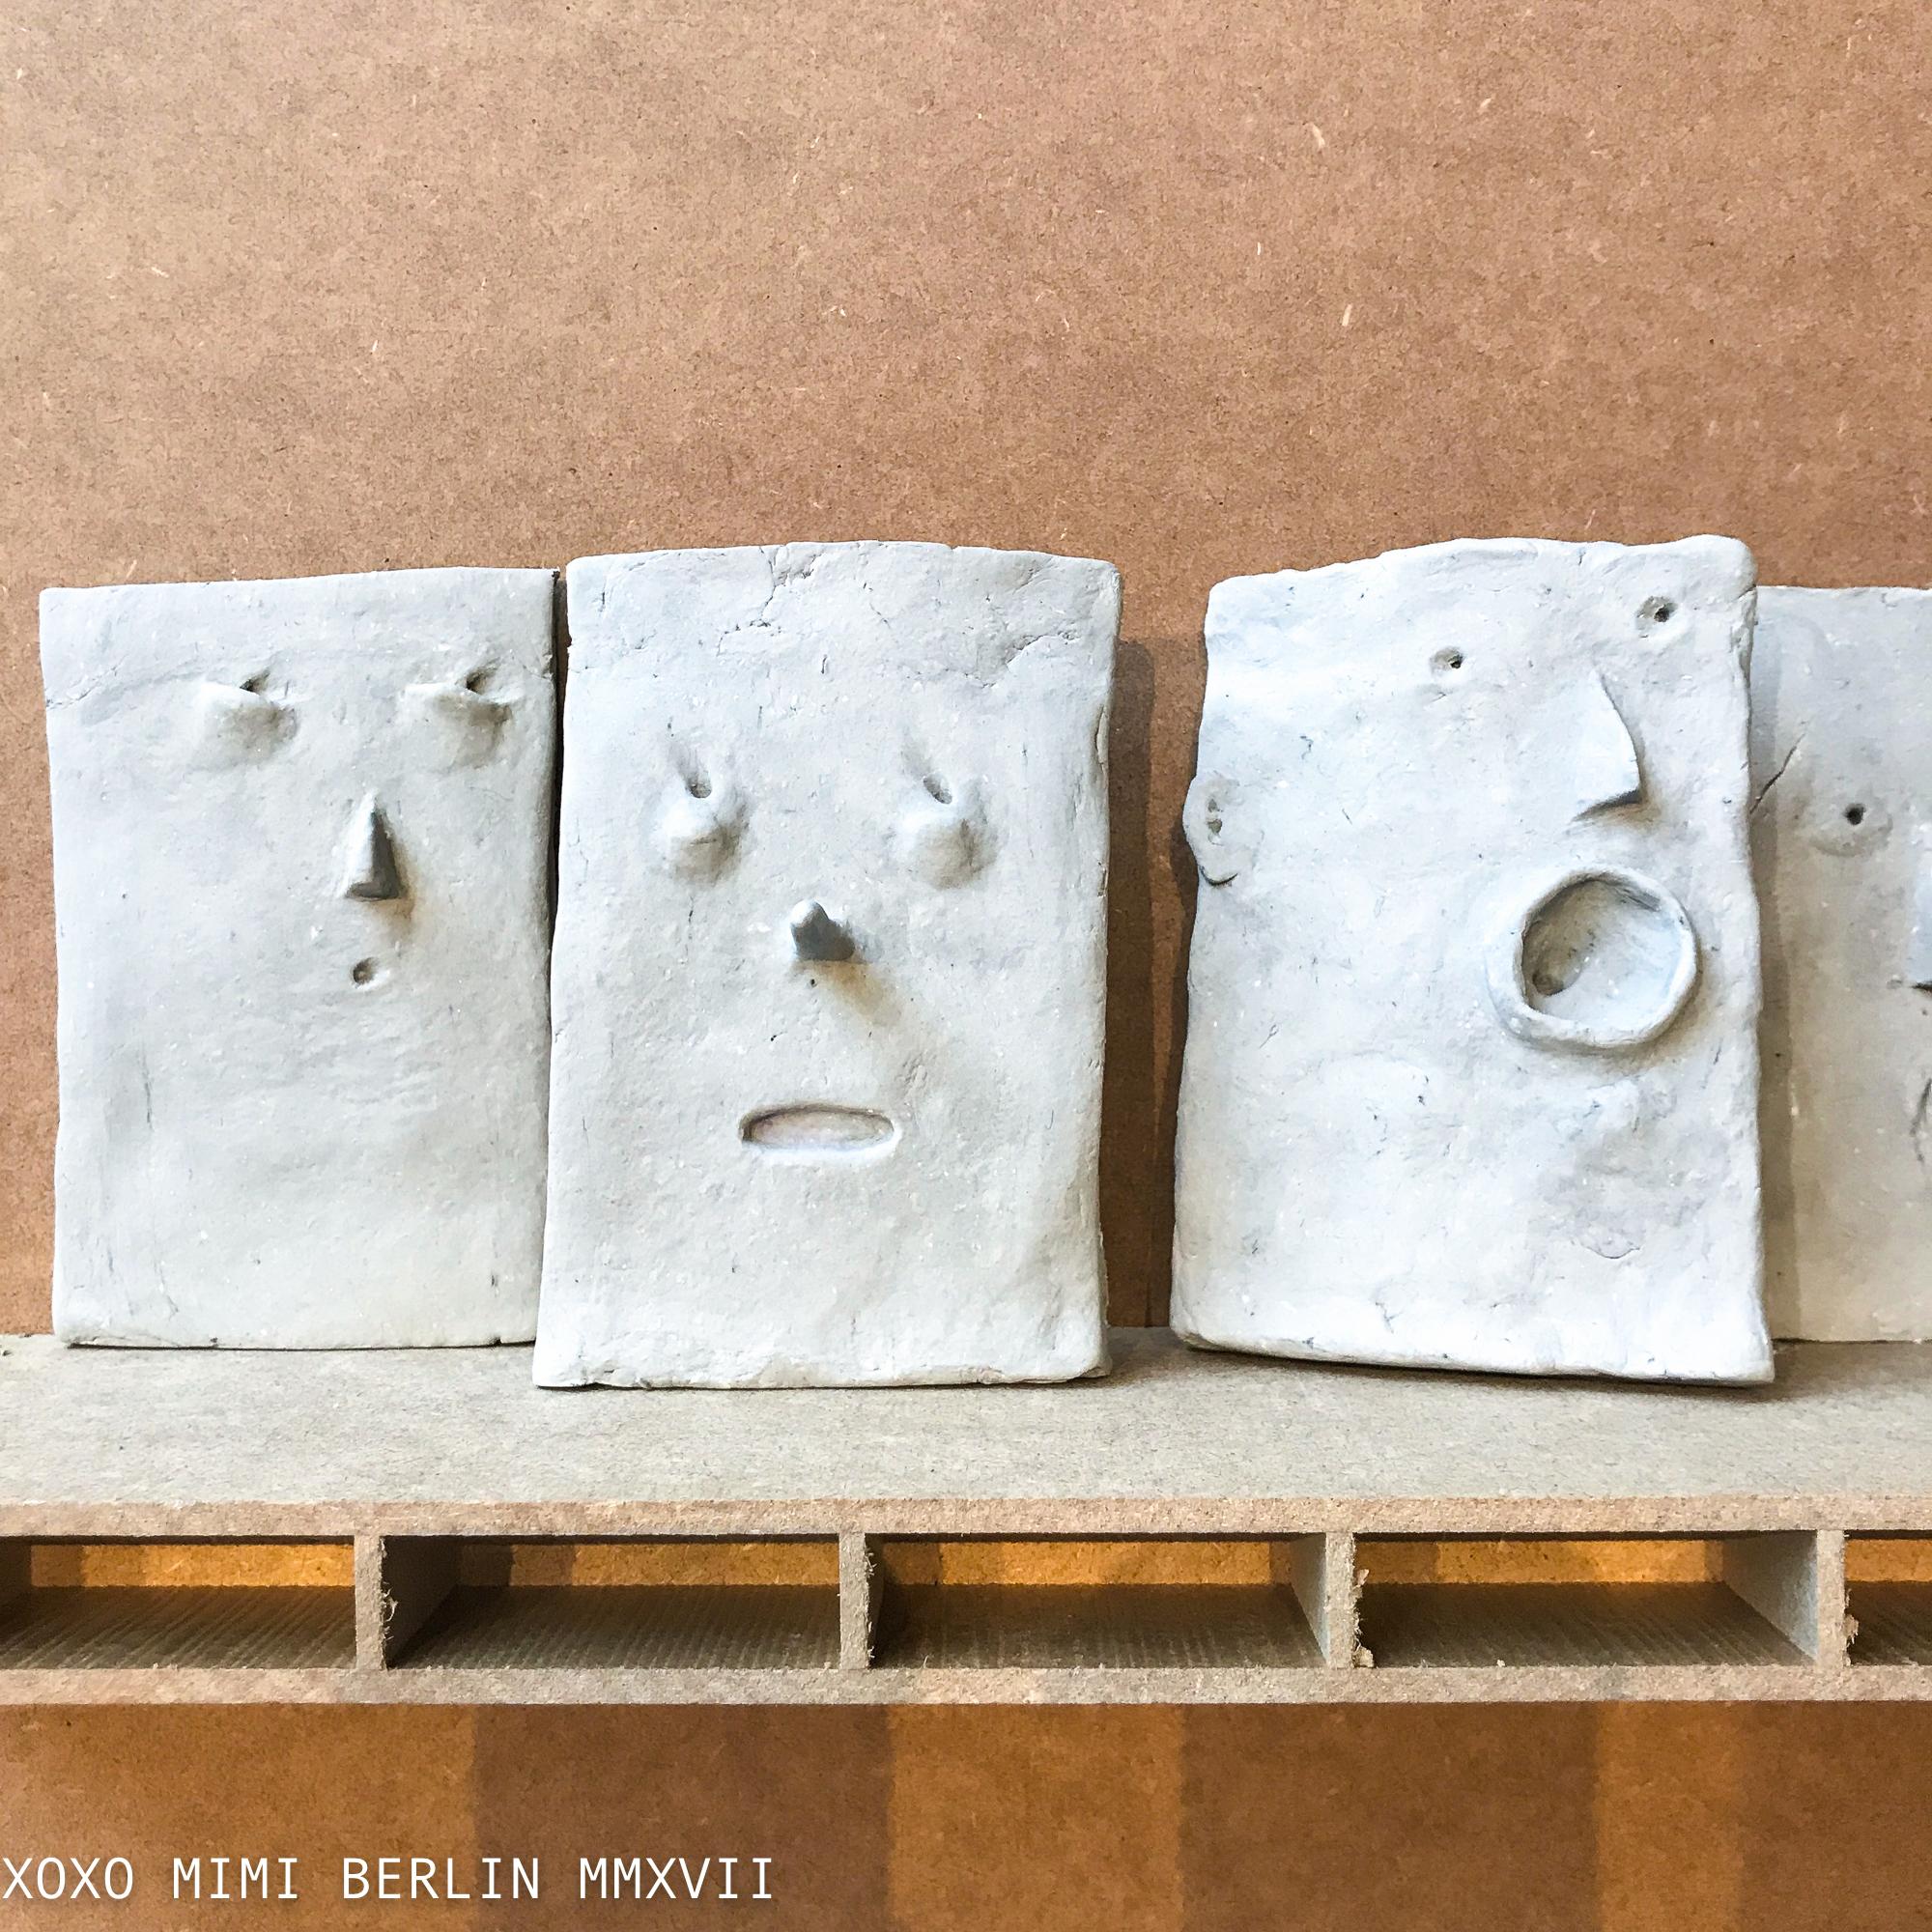 petrified expressions by Roosje van Domselaar at Post Modern